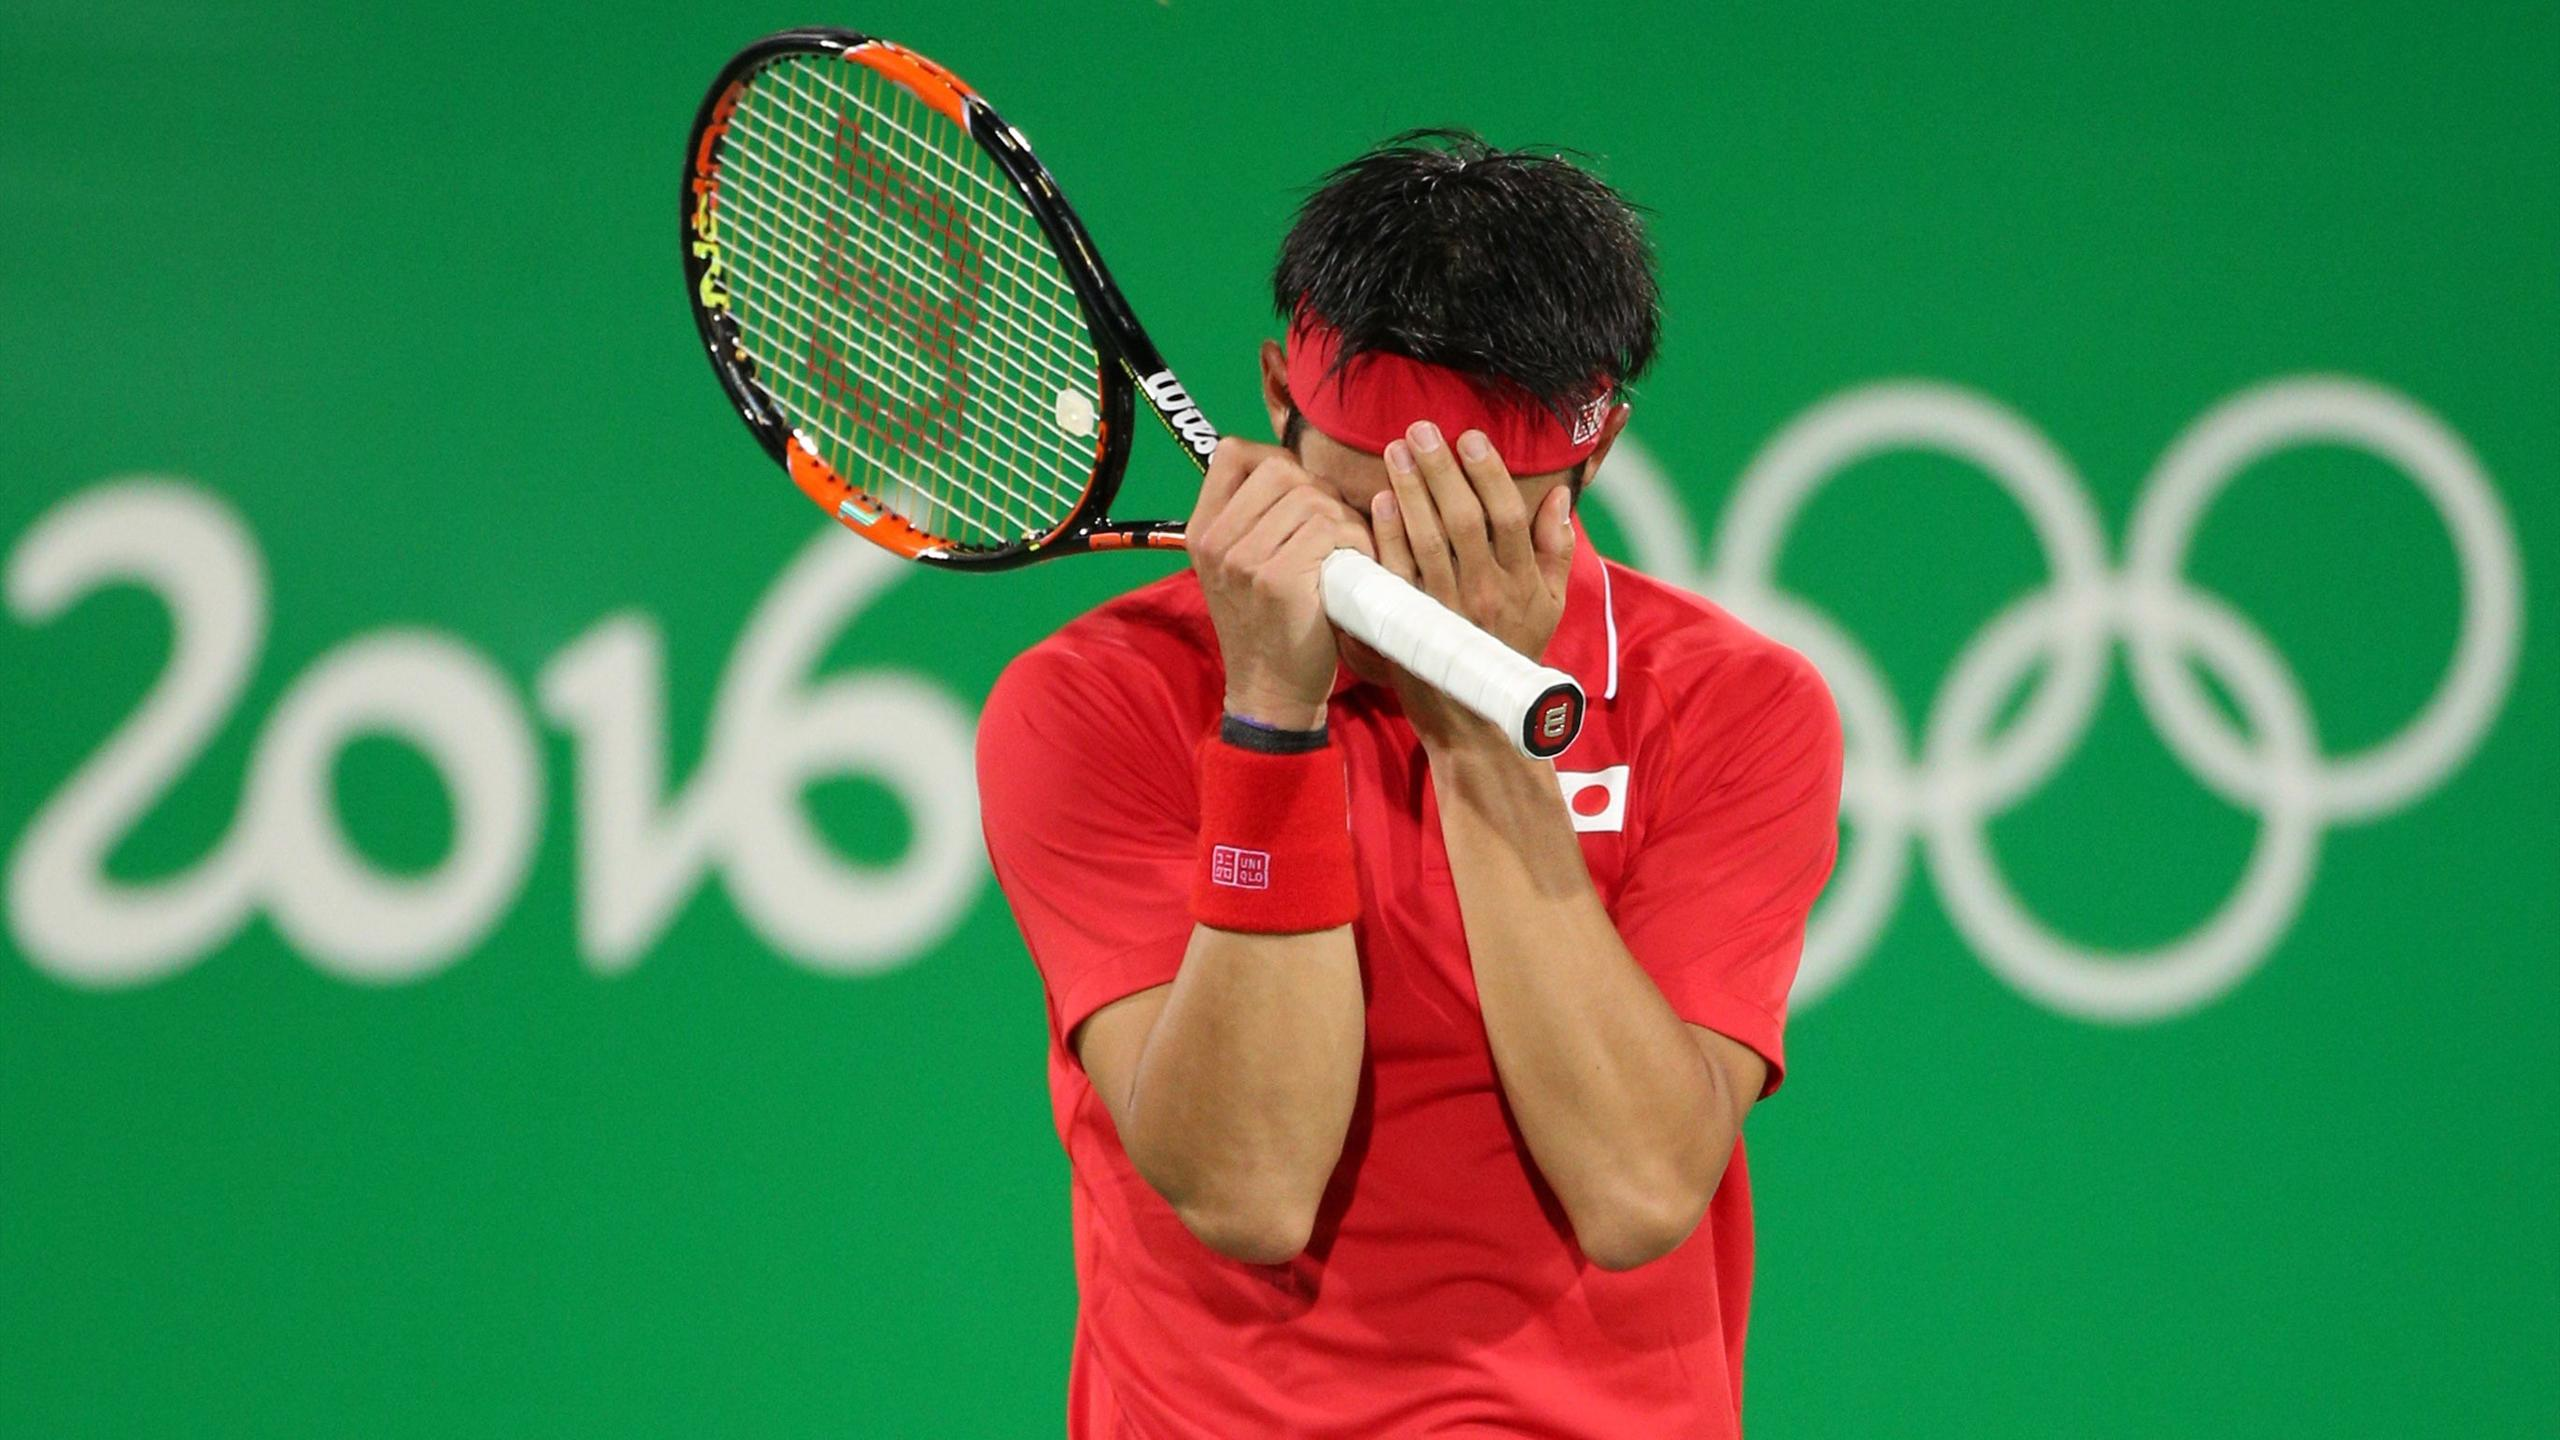 Kei Nishikori (JPN) of Japan celebrates after winning his match against Rafael Nadal to claim the bronze medal